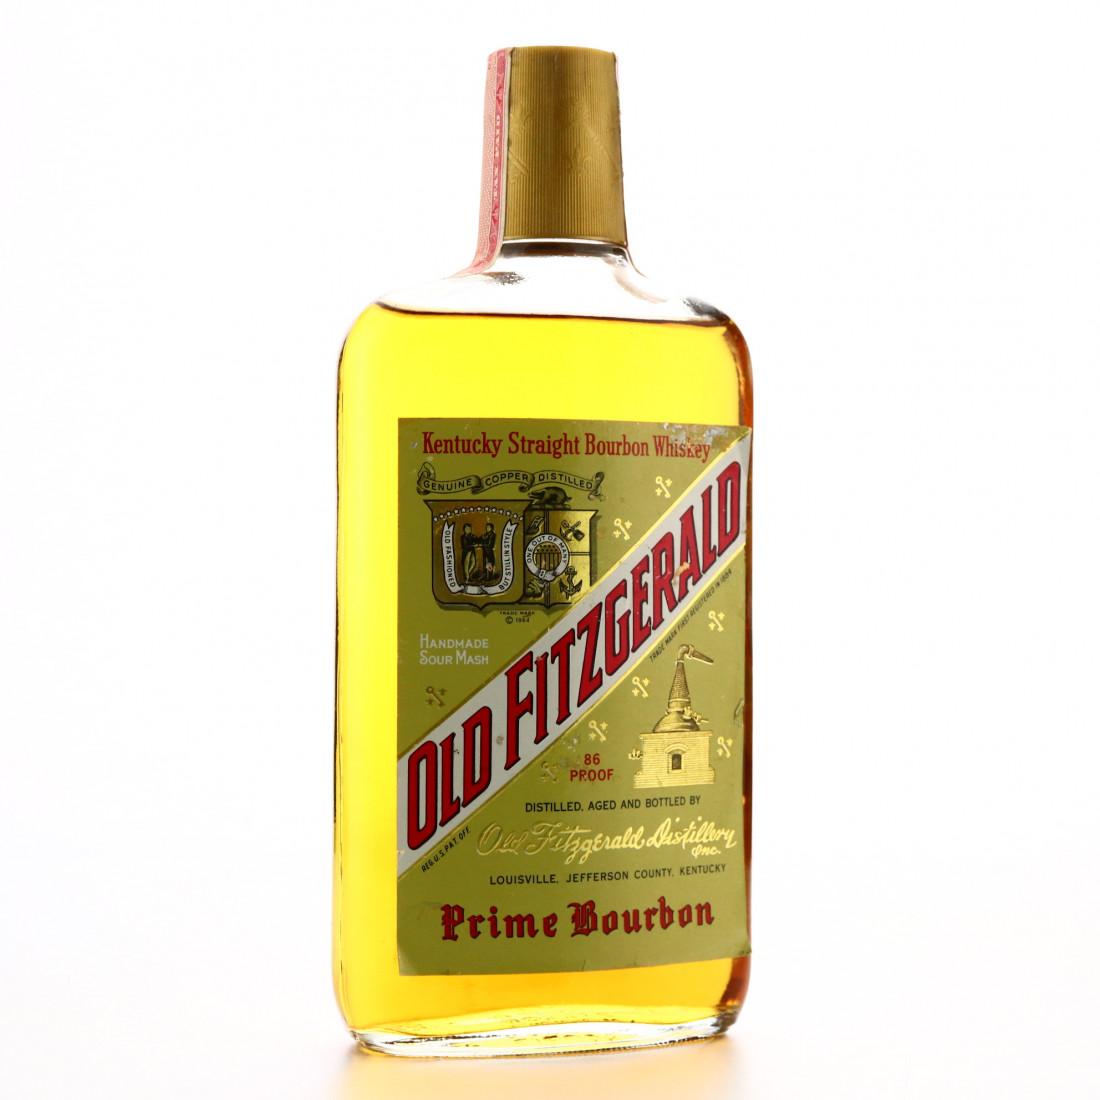 Old Fitzgerald 6 Year Old Prime Bourbon Pint 1975 / Stitzel-Weller